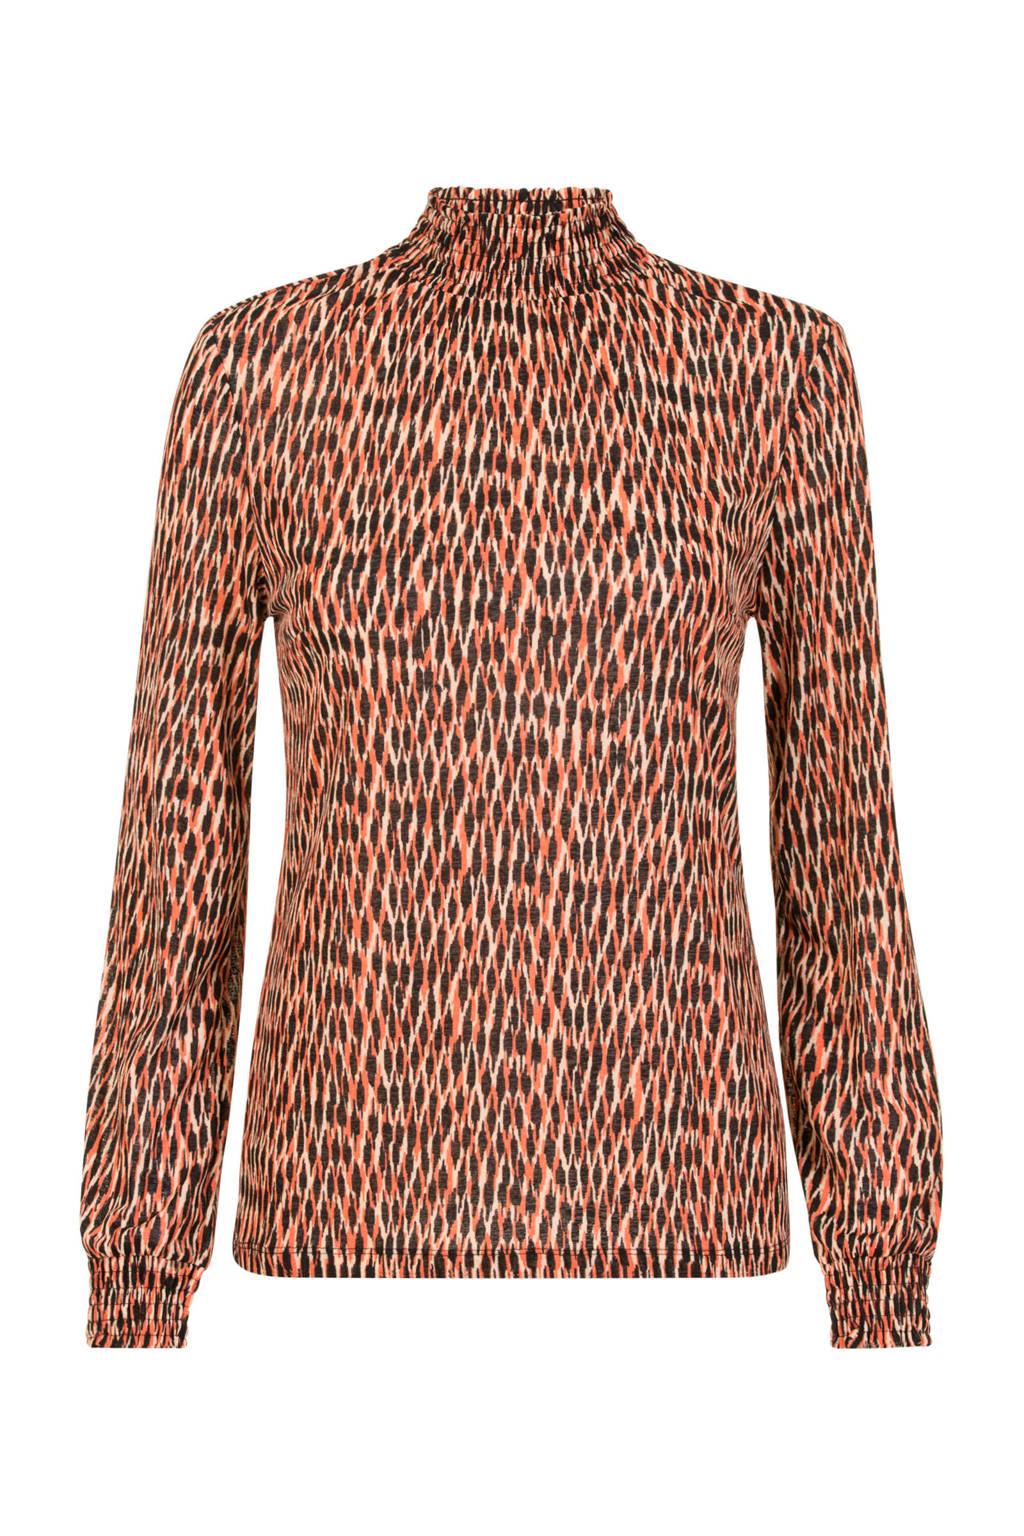 Miss Etam Regulier T-shirt met all over print rood, Rood